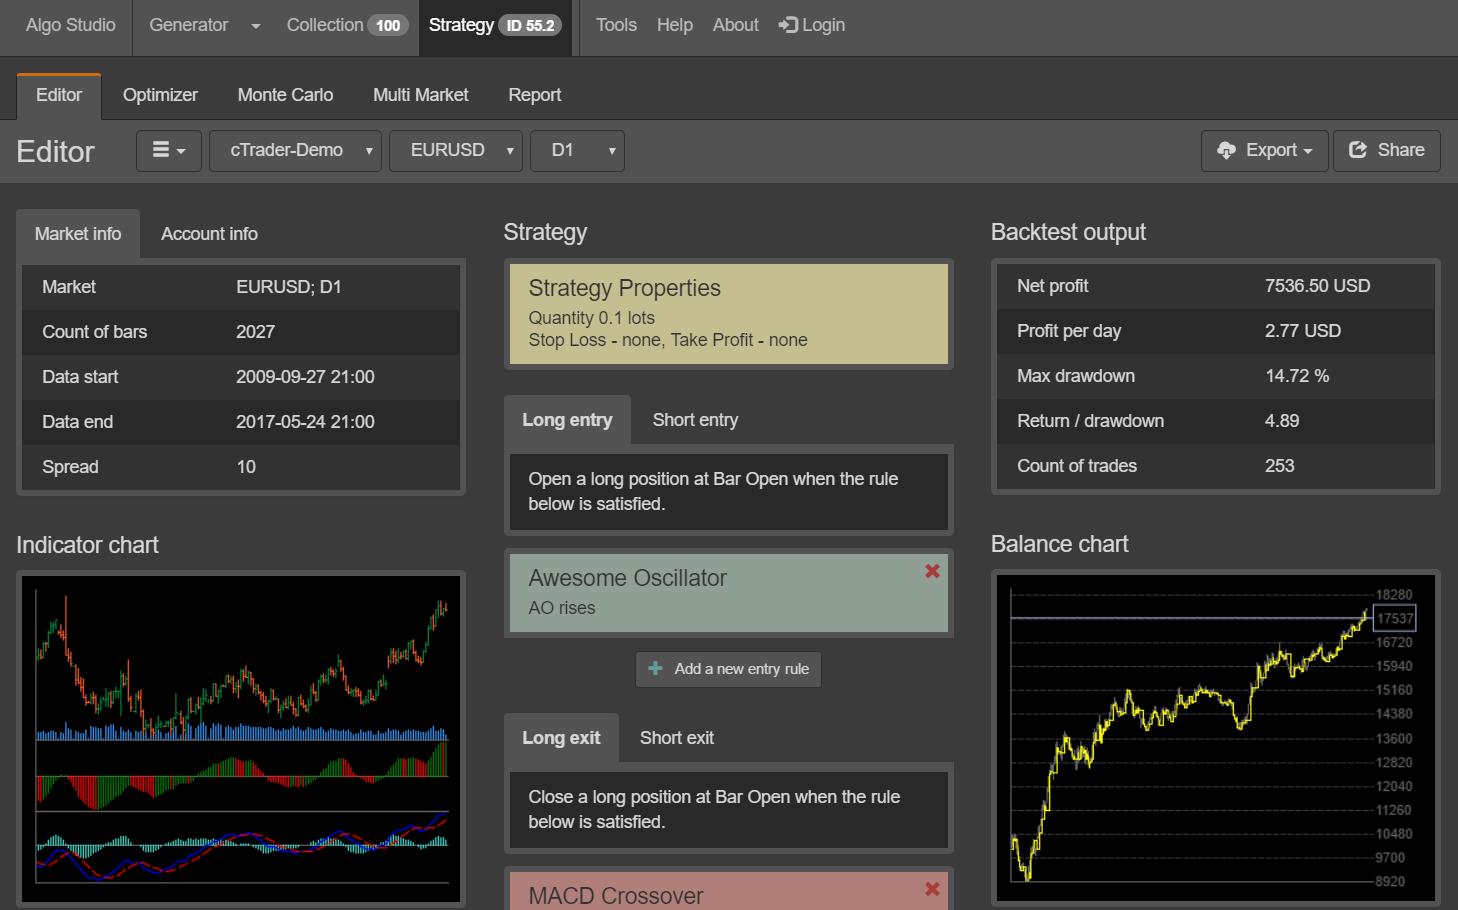 Algo Studio - Editor Screenshot